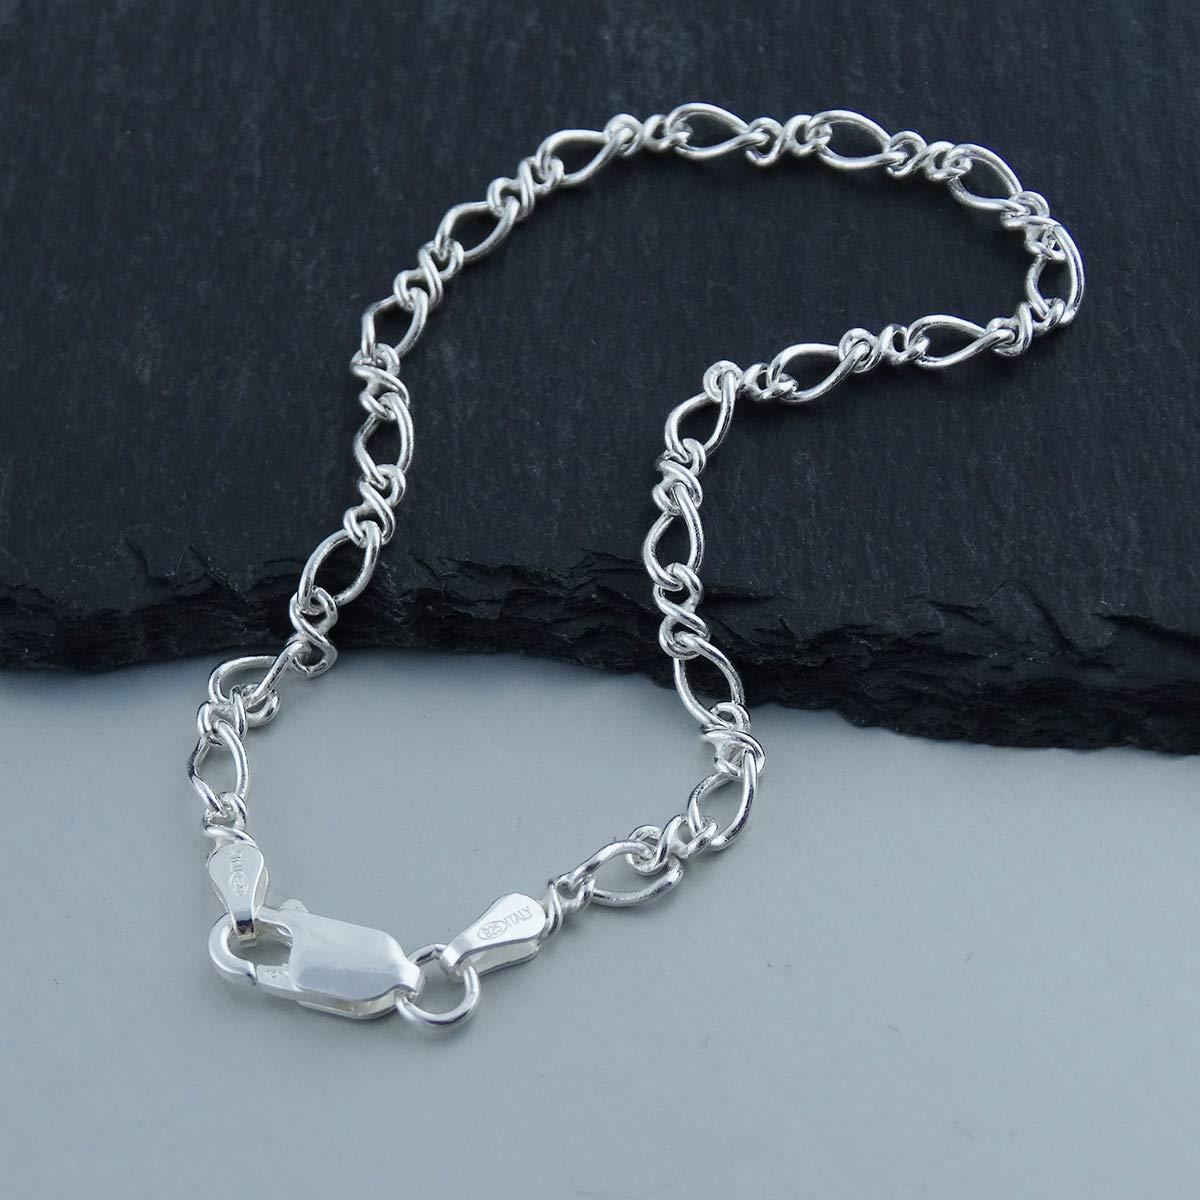 FashionJunkie4Life Sterling Silver Figure 8 Link Charm Bracelet Lobster Clasp 7 or 8 Length